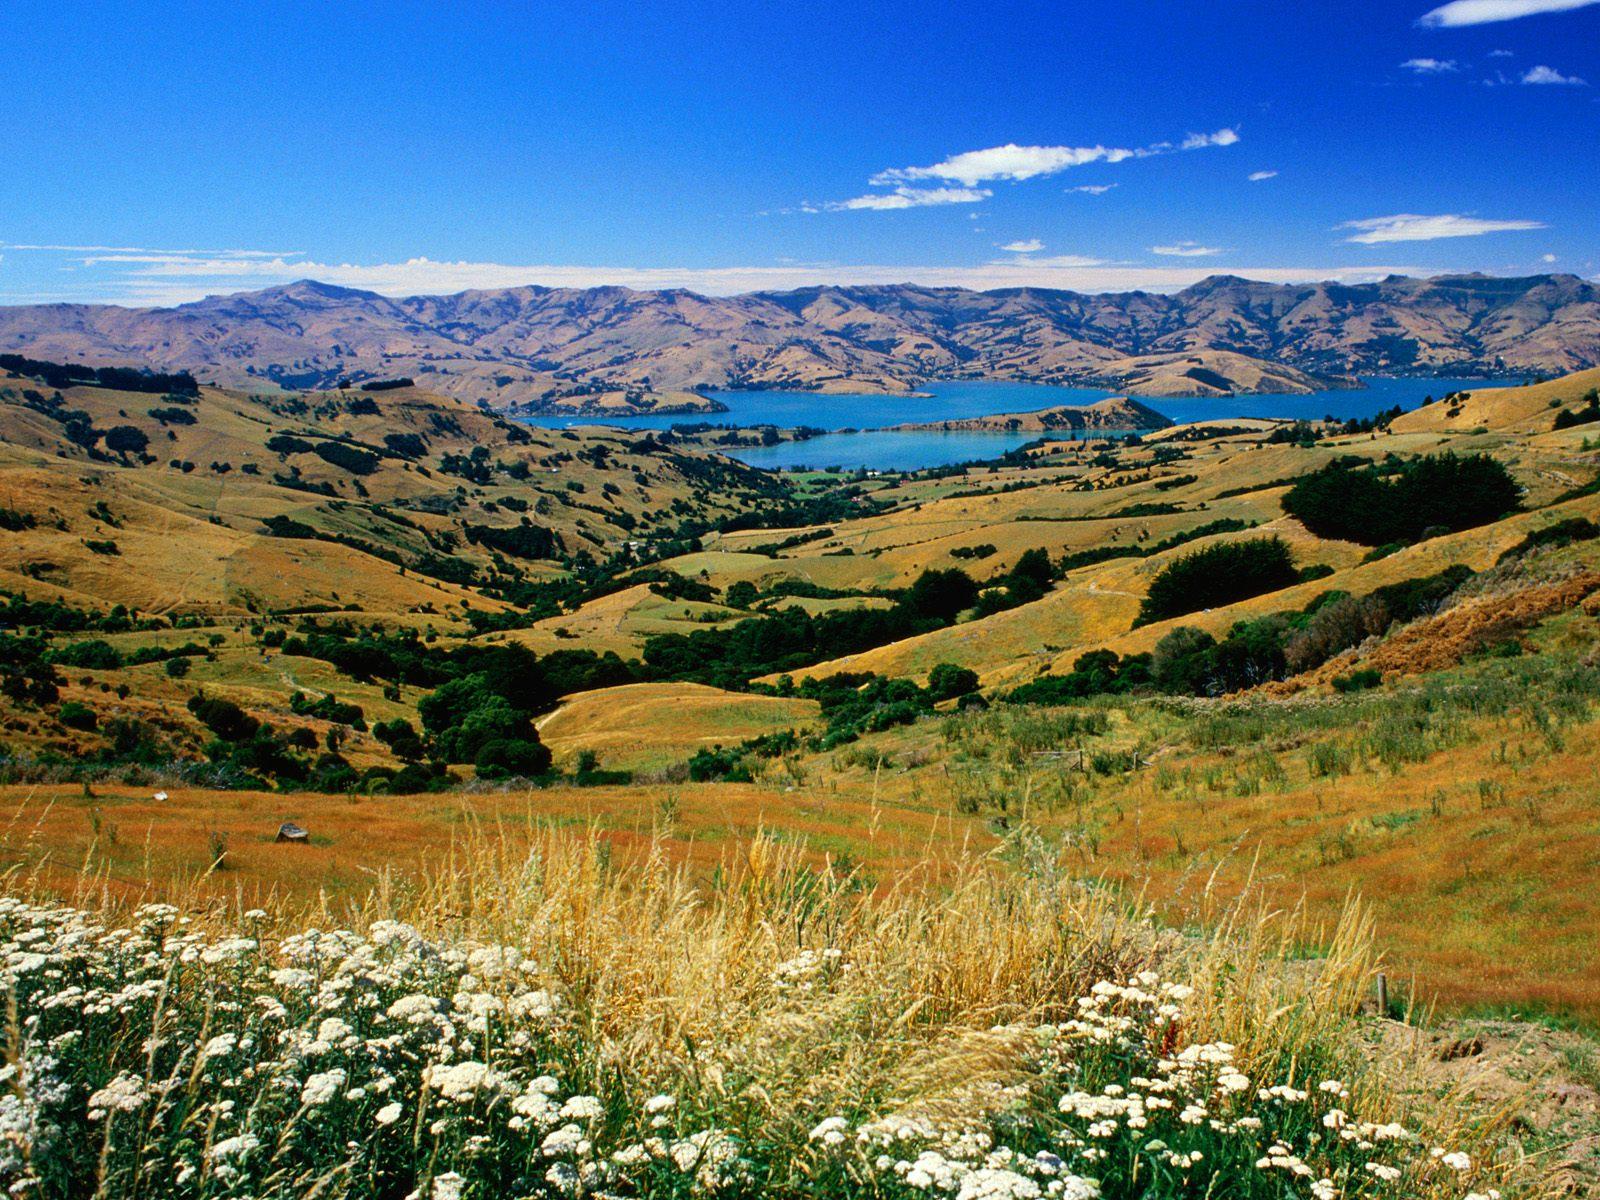 http://1.bp.blogspot.com/-ZeSotD-0U5Y/T2ecAf2BOiI/AAAAAAAAAtM/O0FNxrO3tOw/s1600/Christchurch+Countryside,+Canterbury,+New+Zealand.jpg